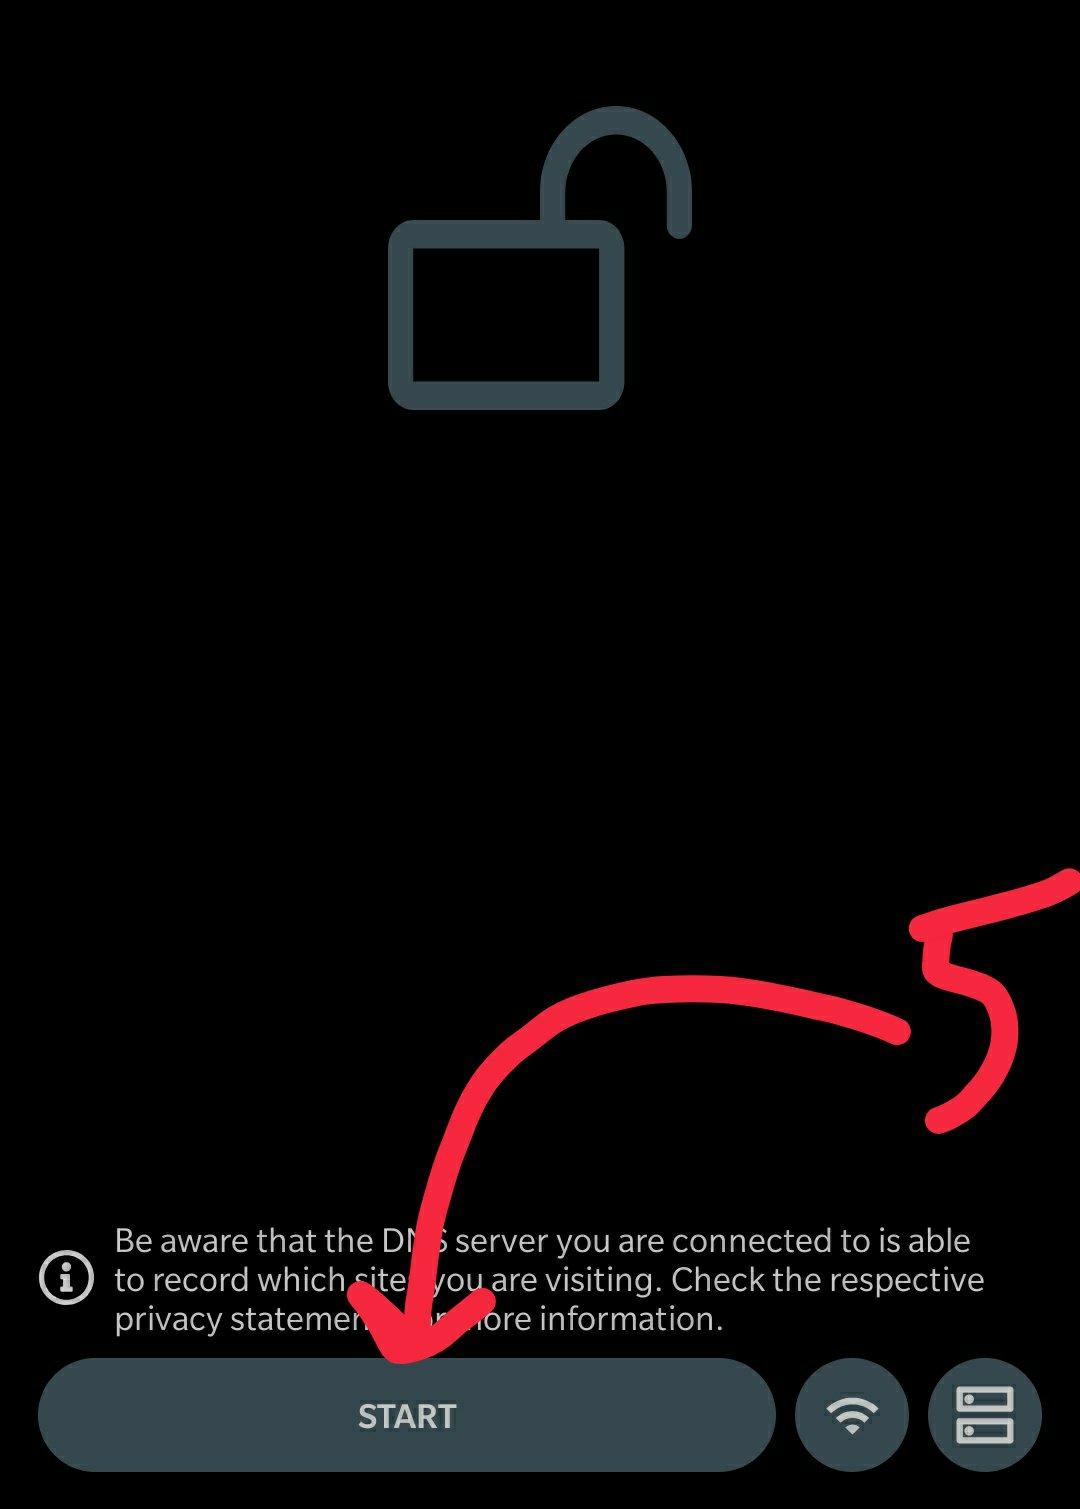 Click image for larger version  Name:Screenshot_20191015-185706__01.jpg Views:264 Size:62.9 KB ID:4845353